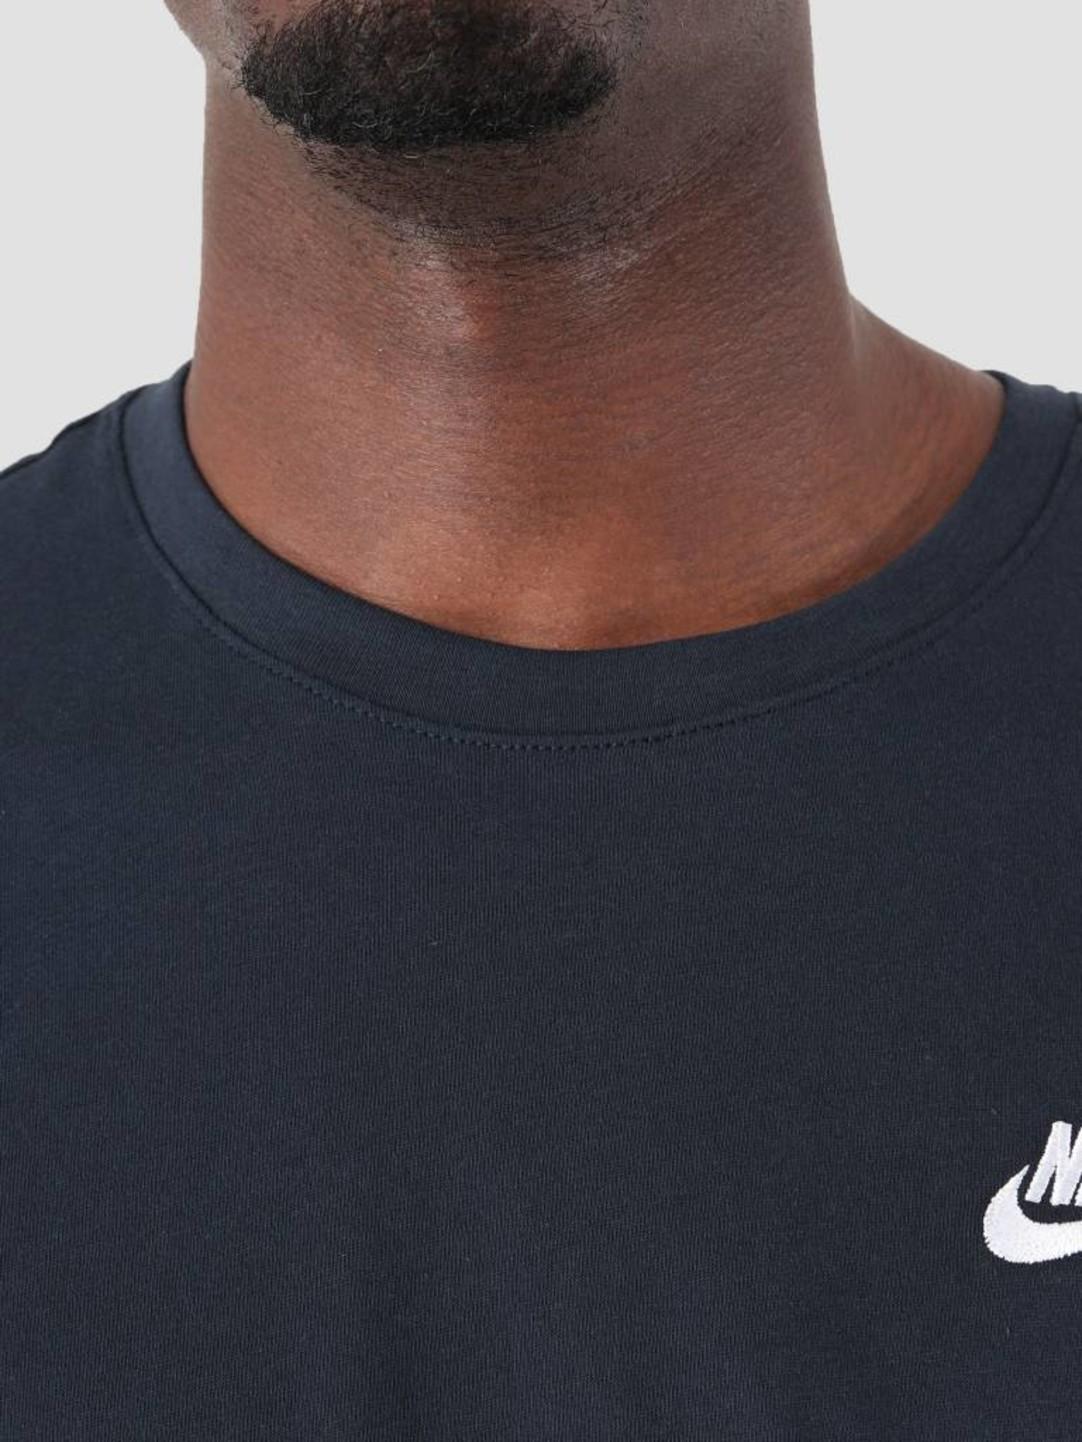 Nike Nike NSW T-Shirt Dark Obsidian White 827021-475